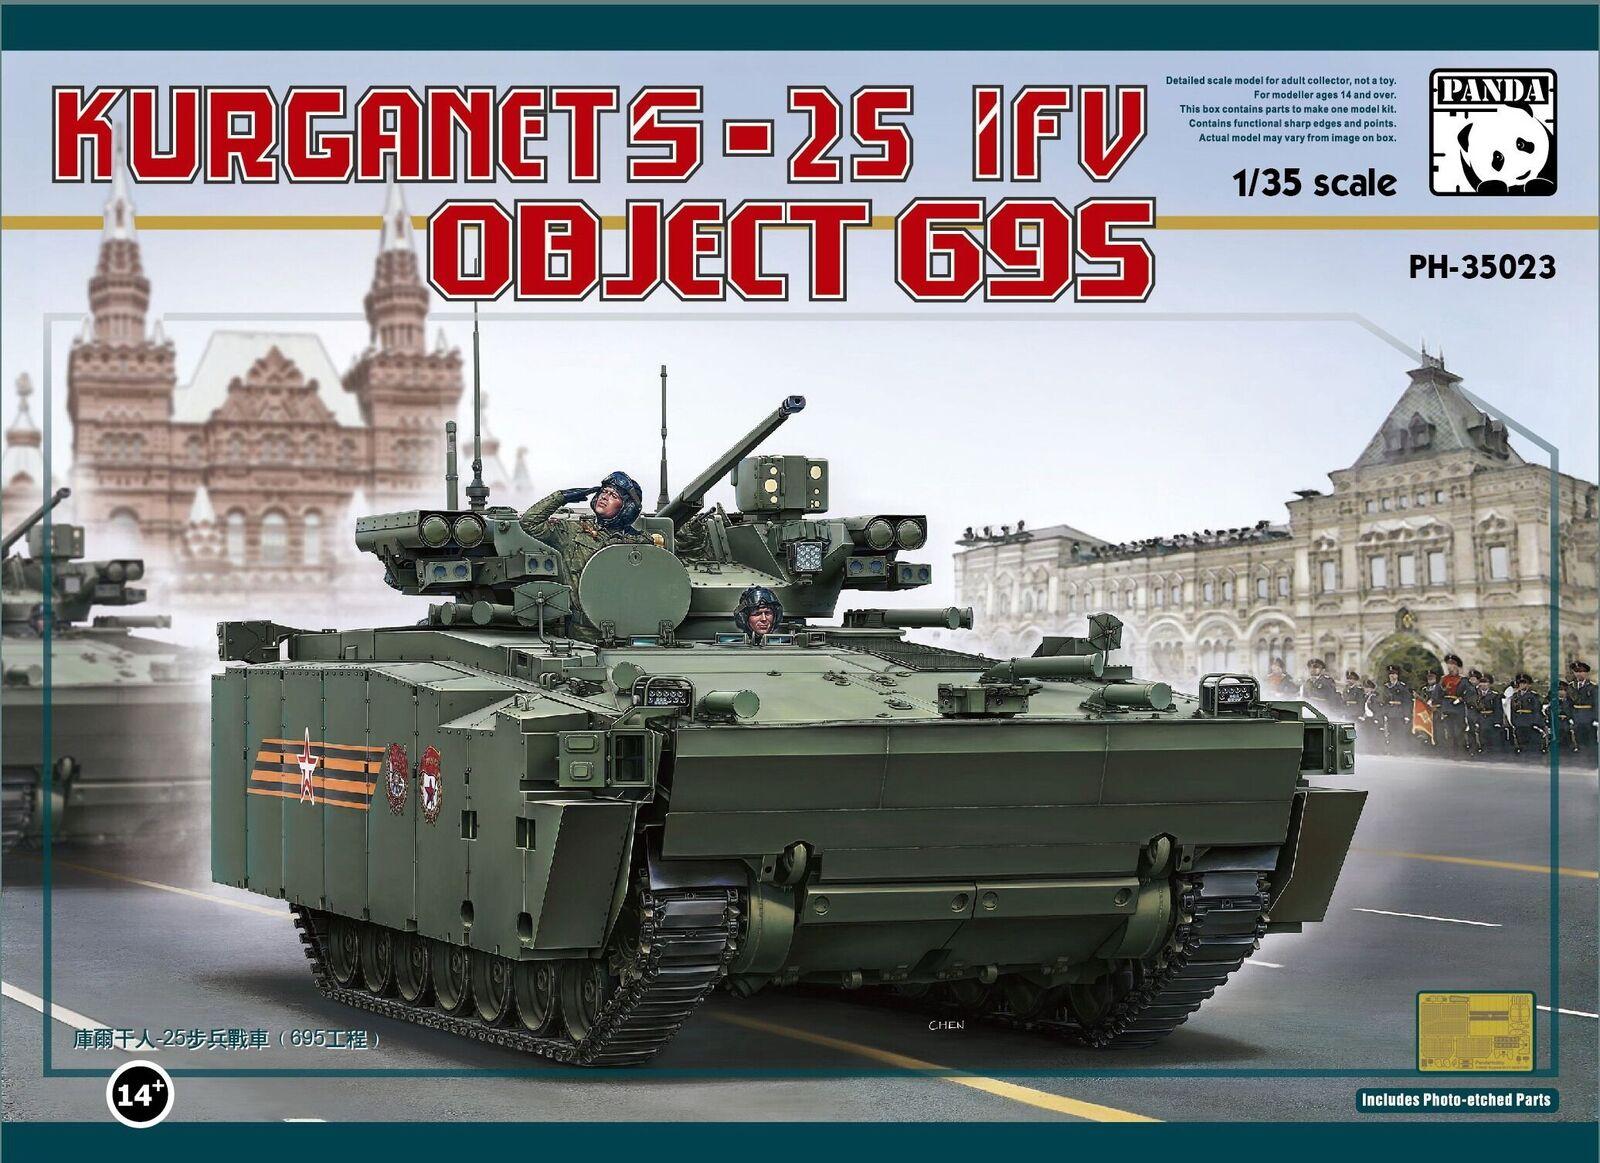 Panda Hobby 1 35 Russian Object 695 IFV Kurganets-25